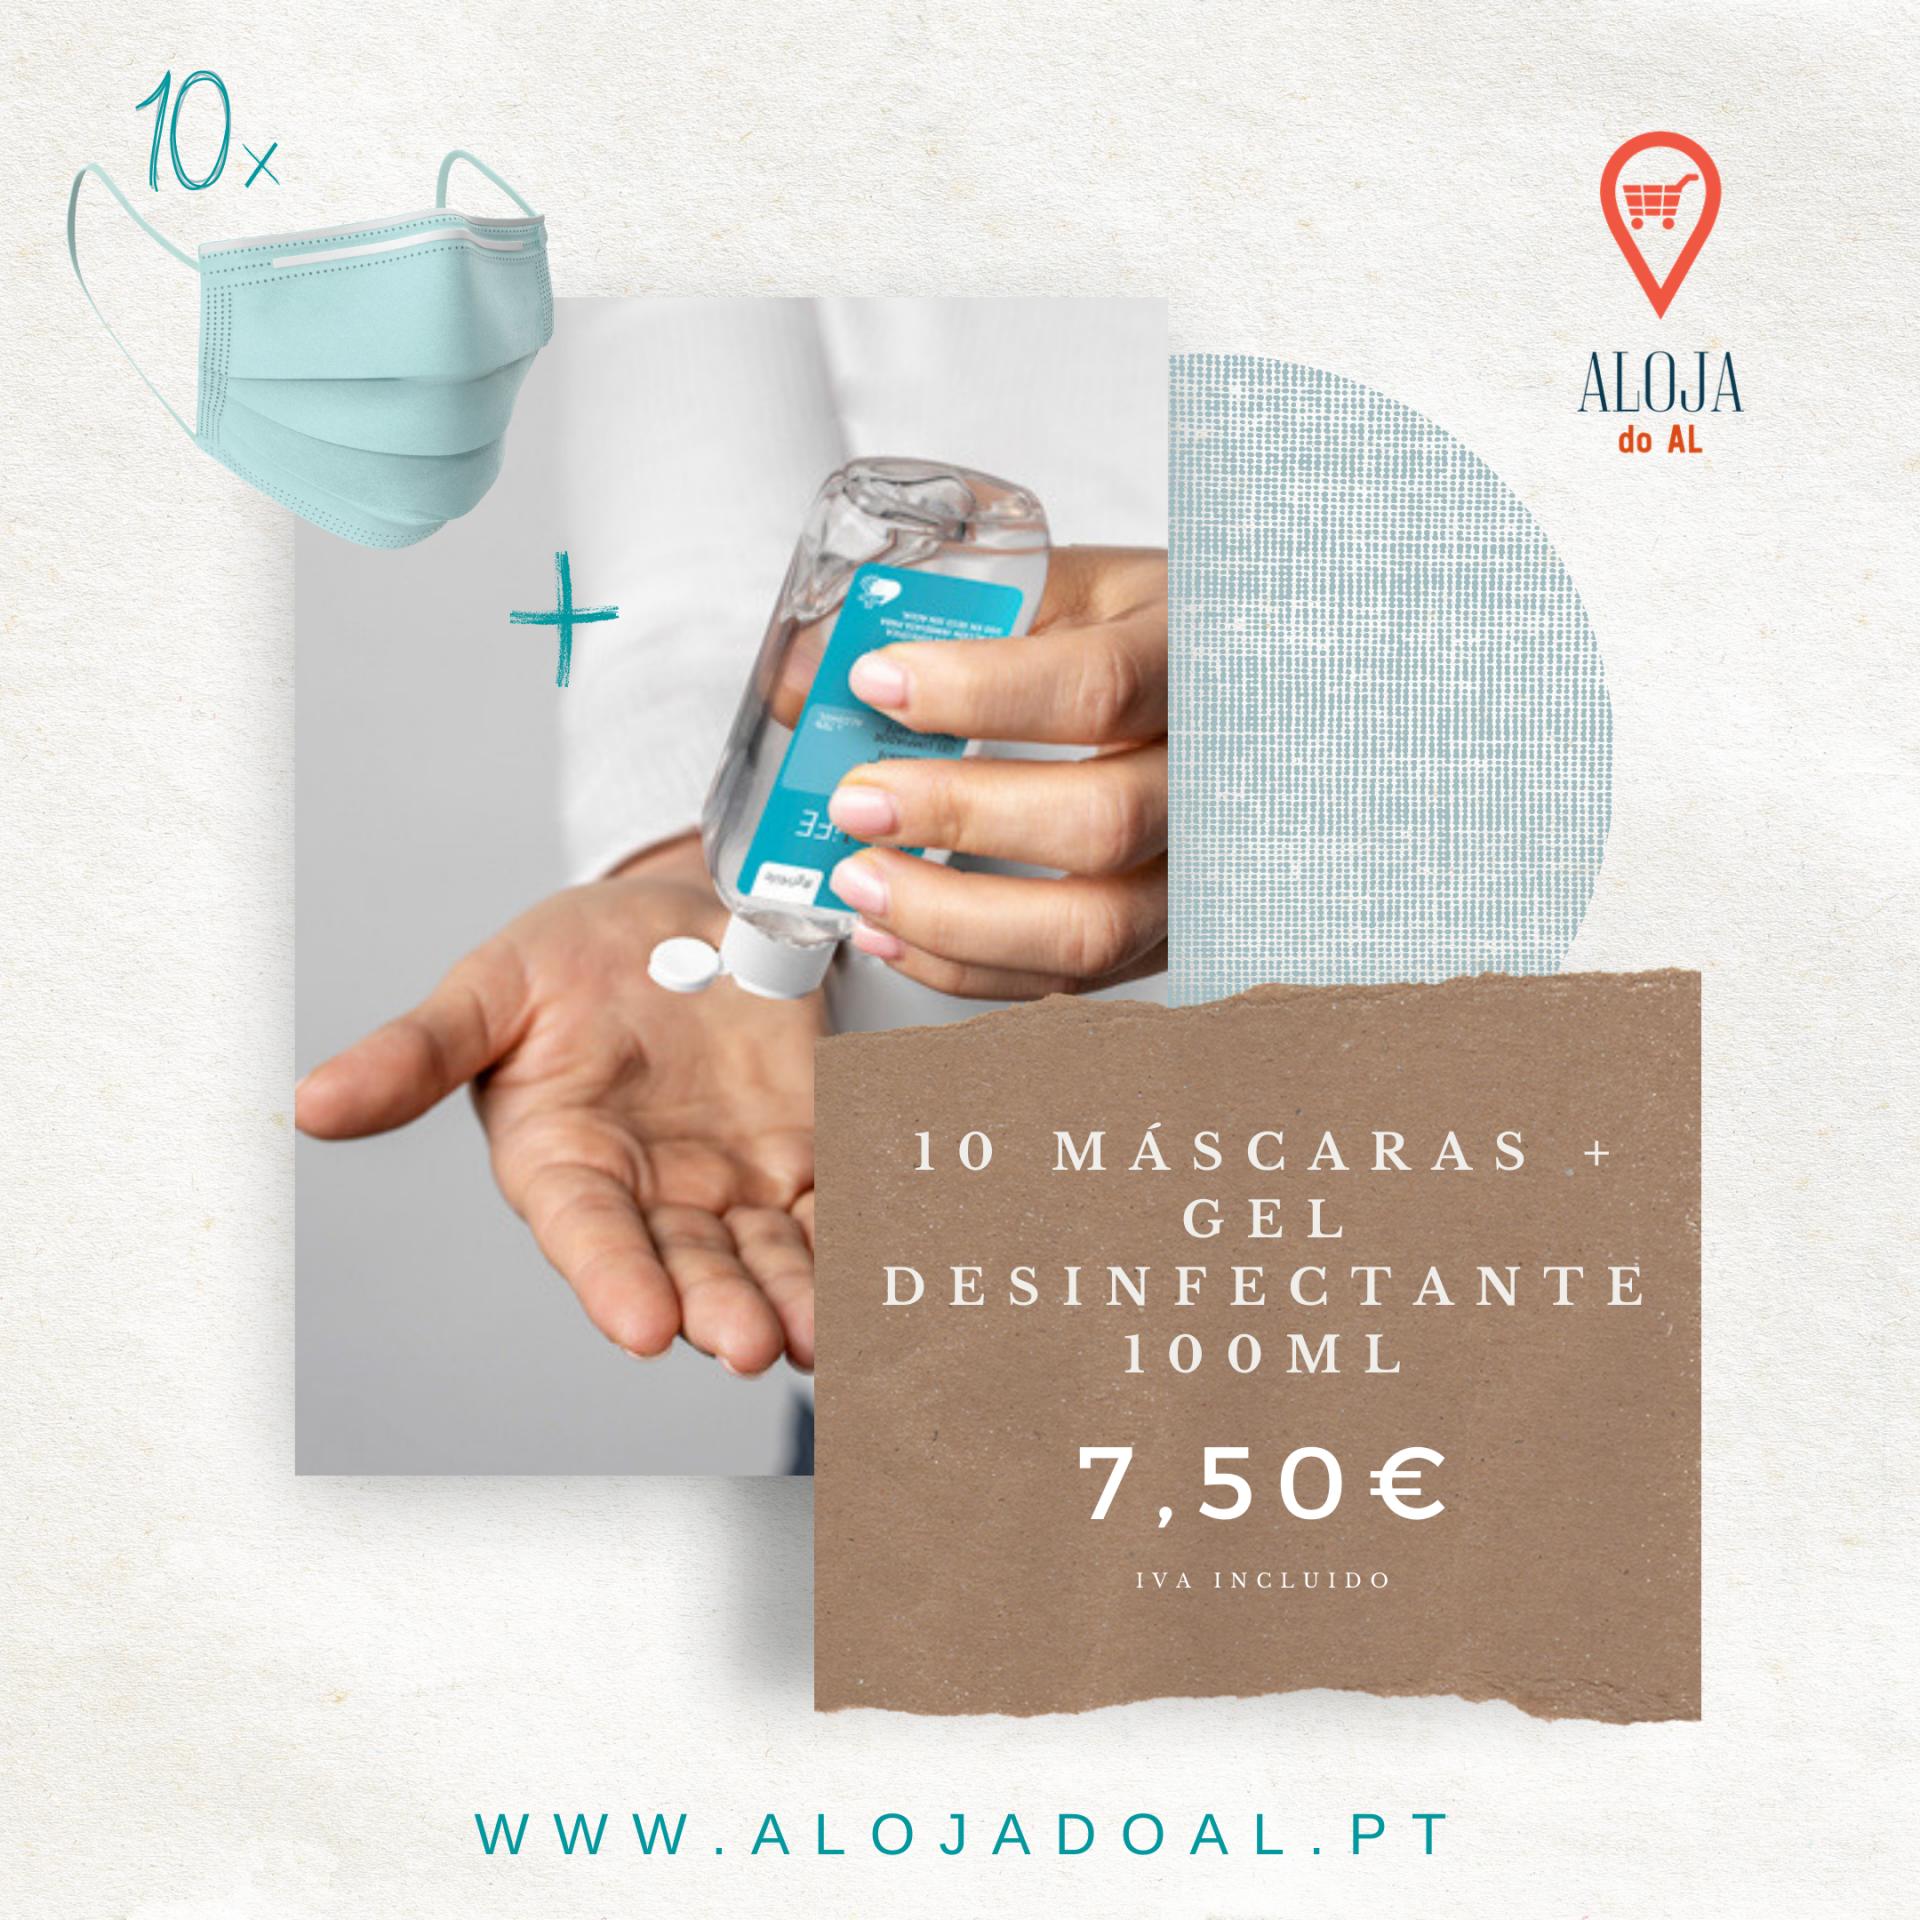 PACK 10 máscaras + Gel Desinfectante 100ml